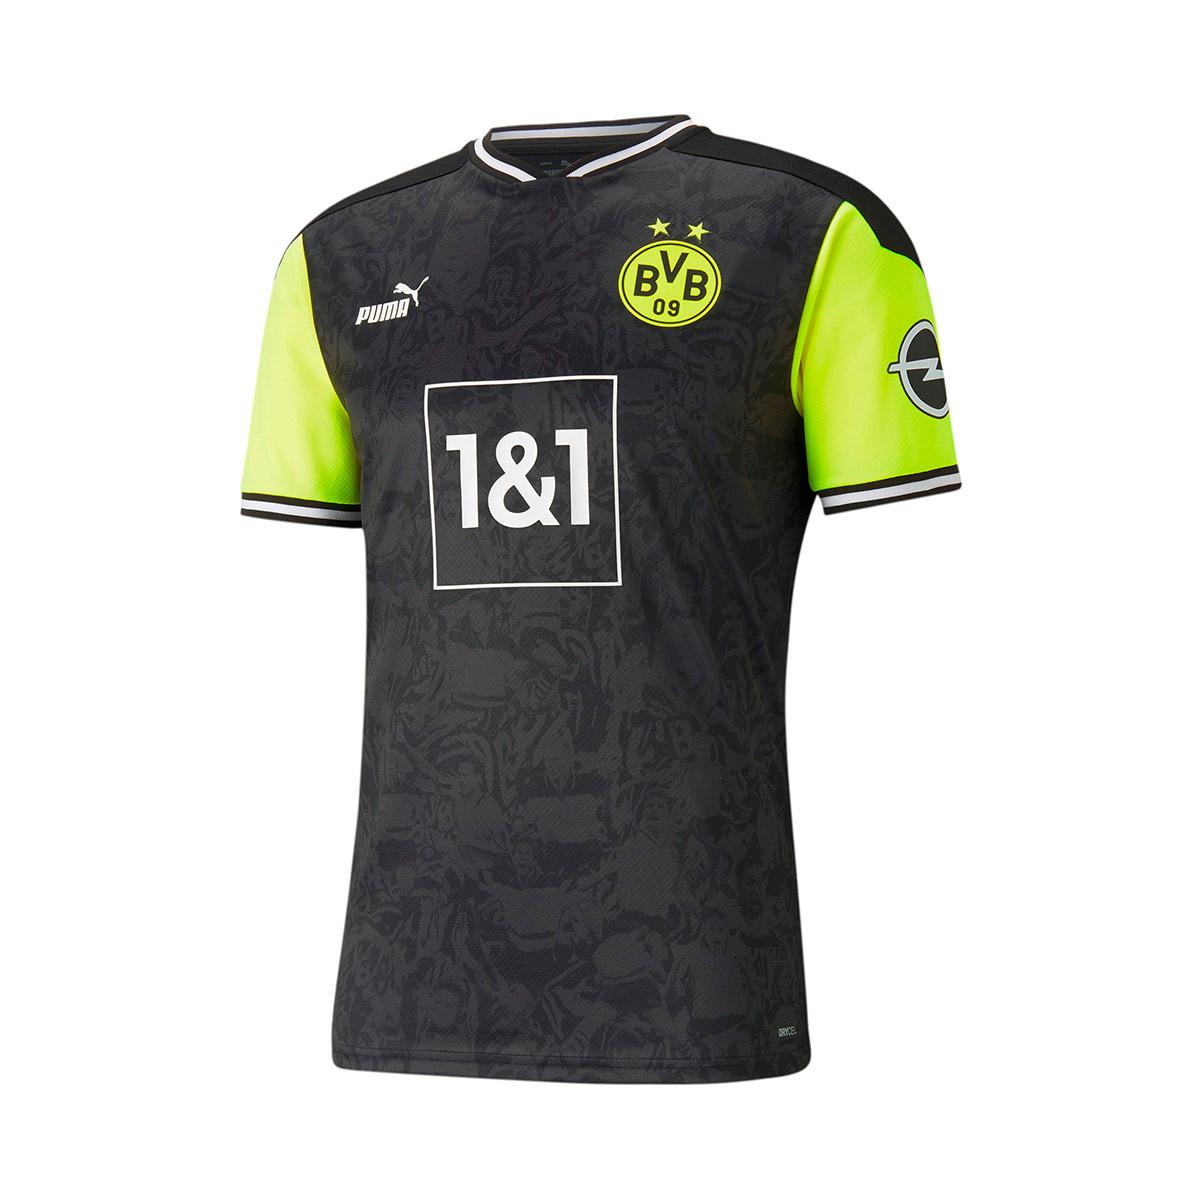 Puma Borussia Dortmund Special Edition Jersey